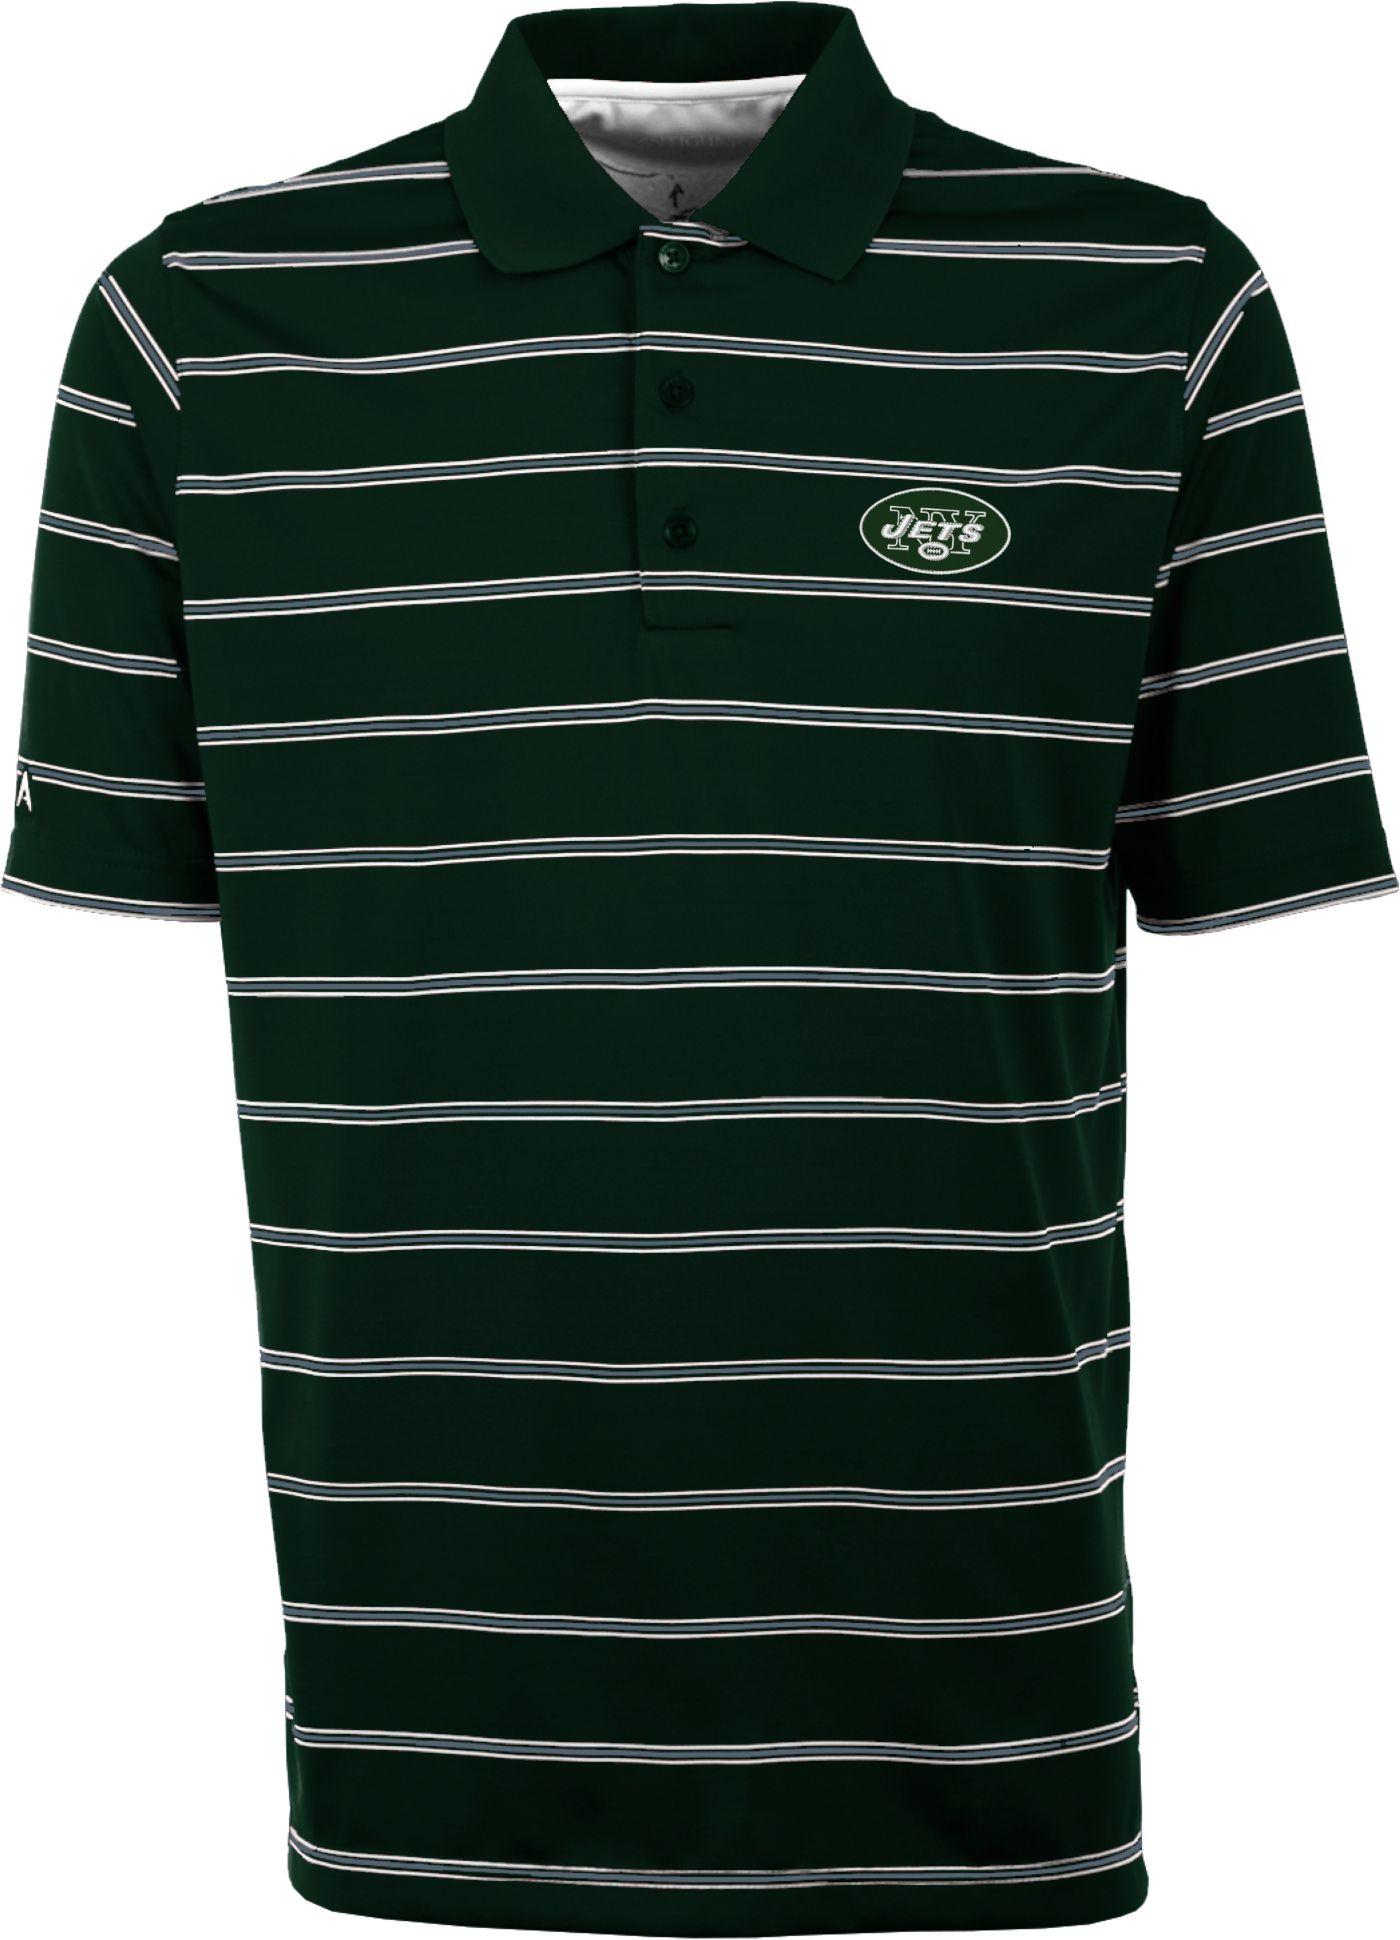 Antiqua Men's New York Jets Deluxe Green Polo